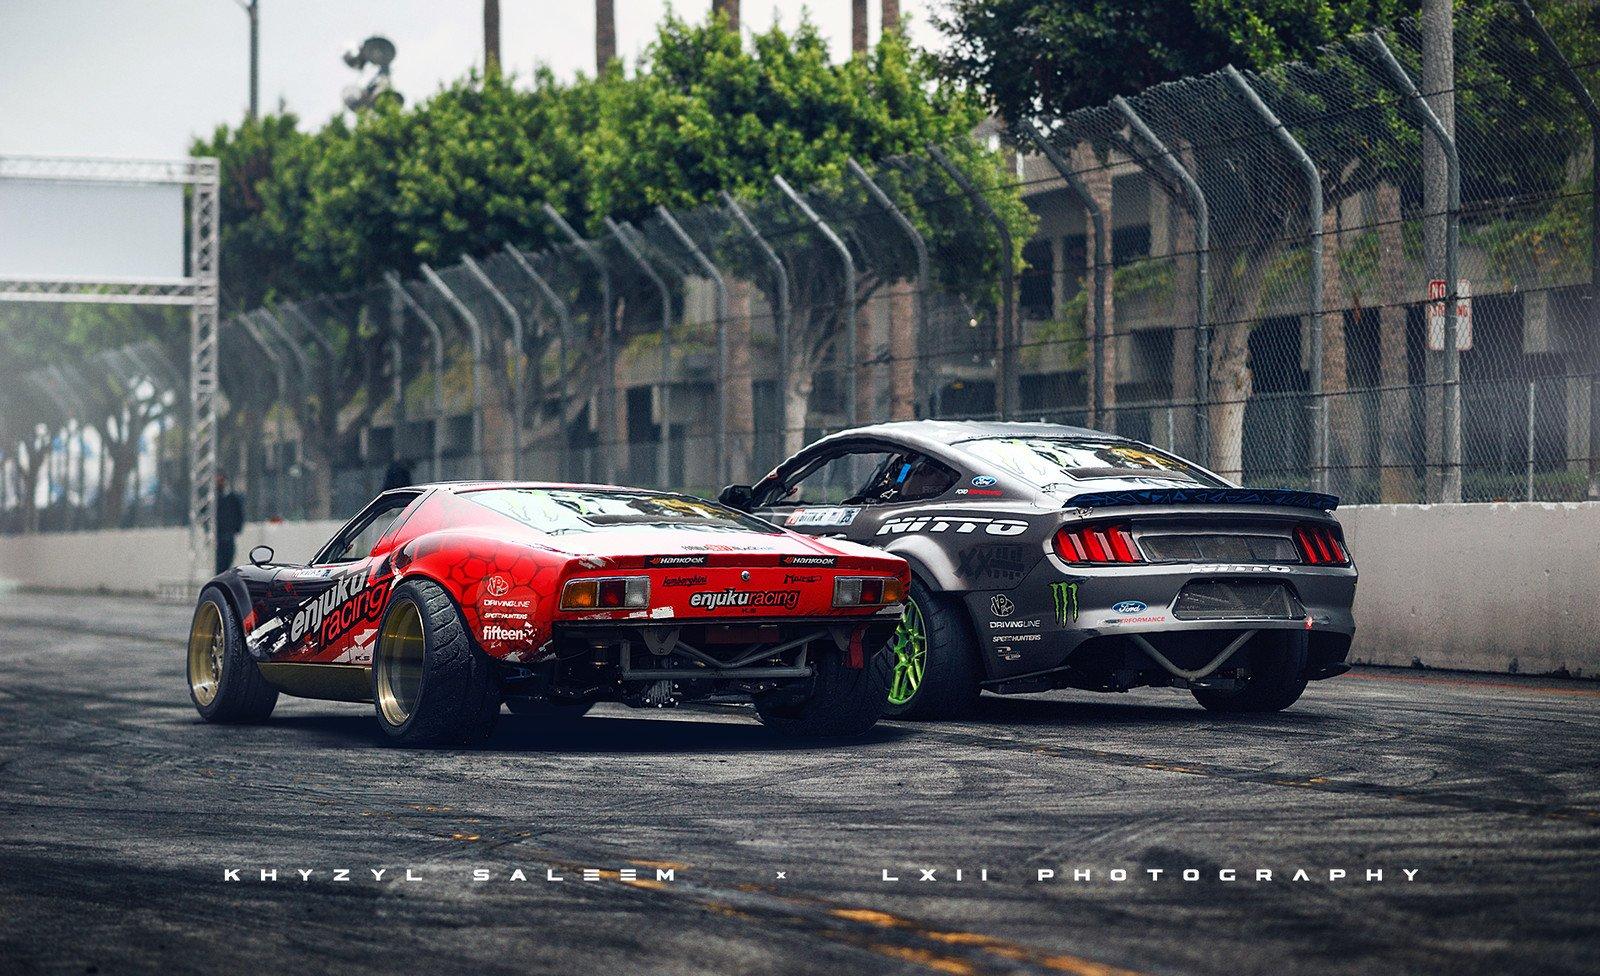 Wallpaper Khyzyl Saleem Car Render Digital Art Formula Drift